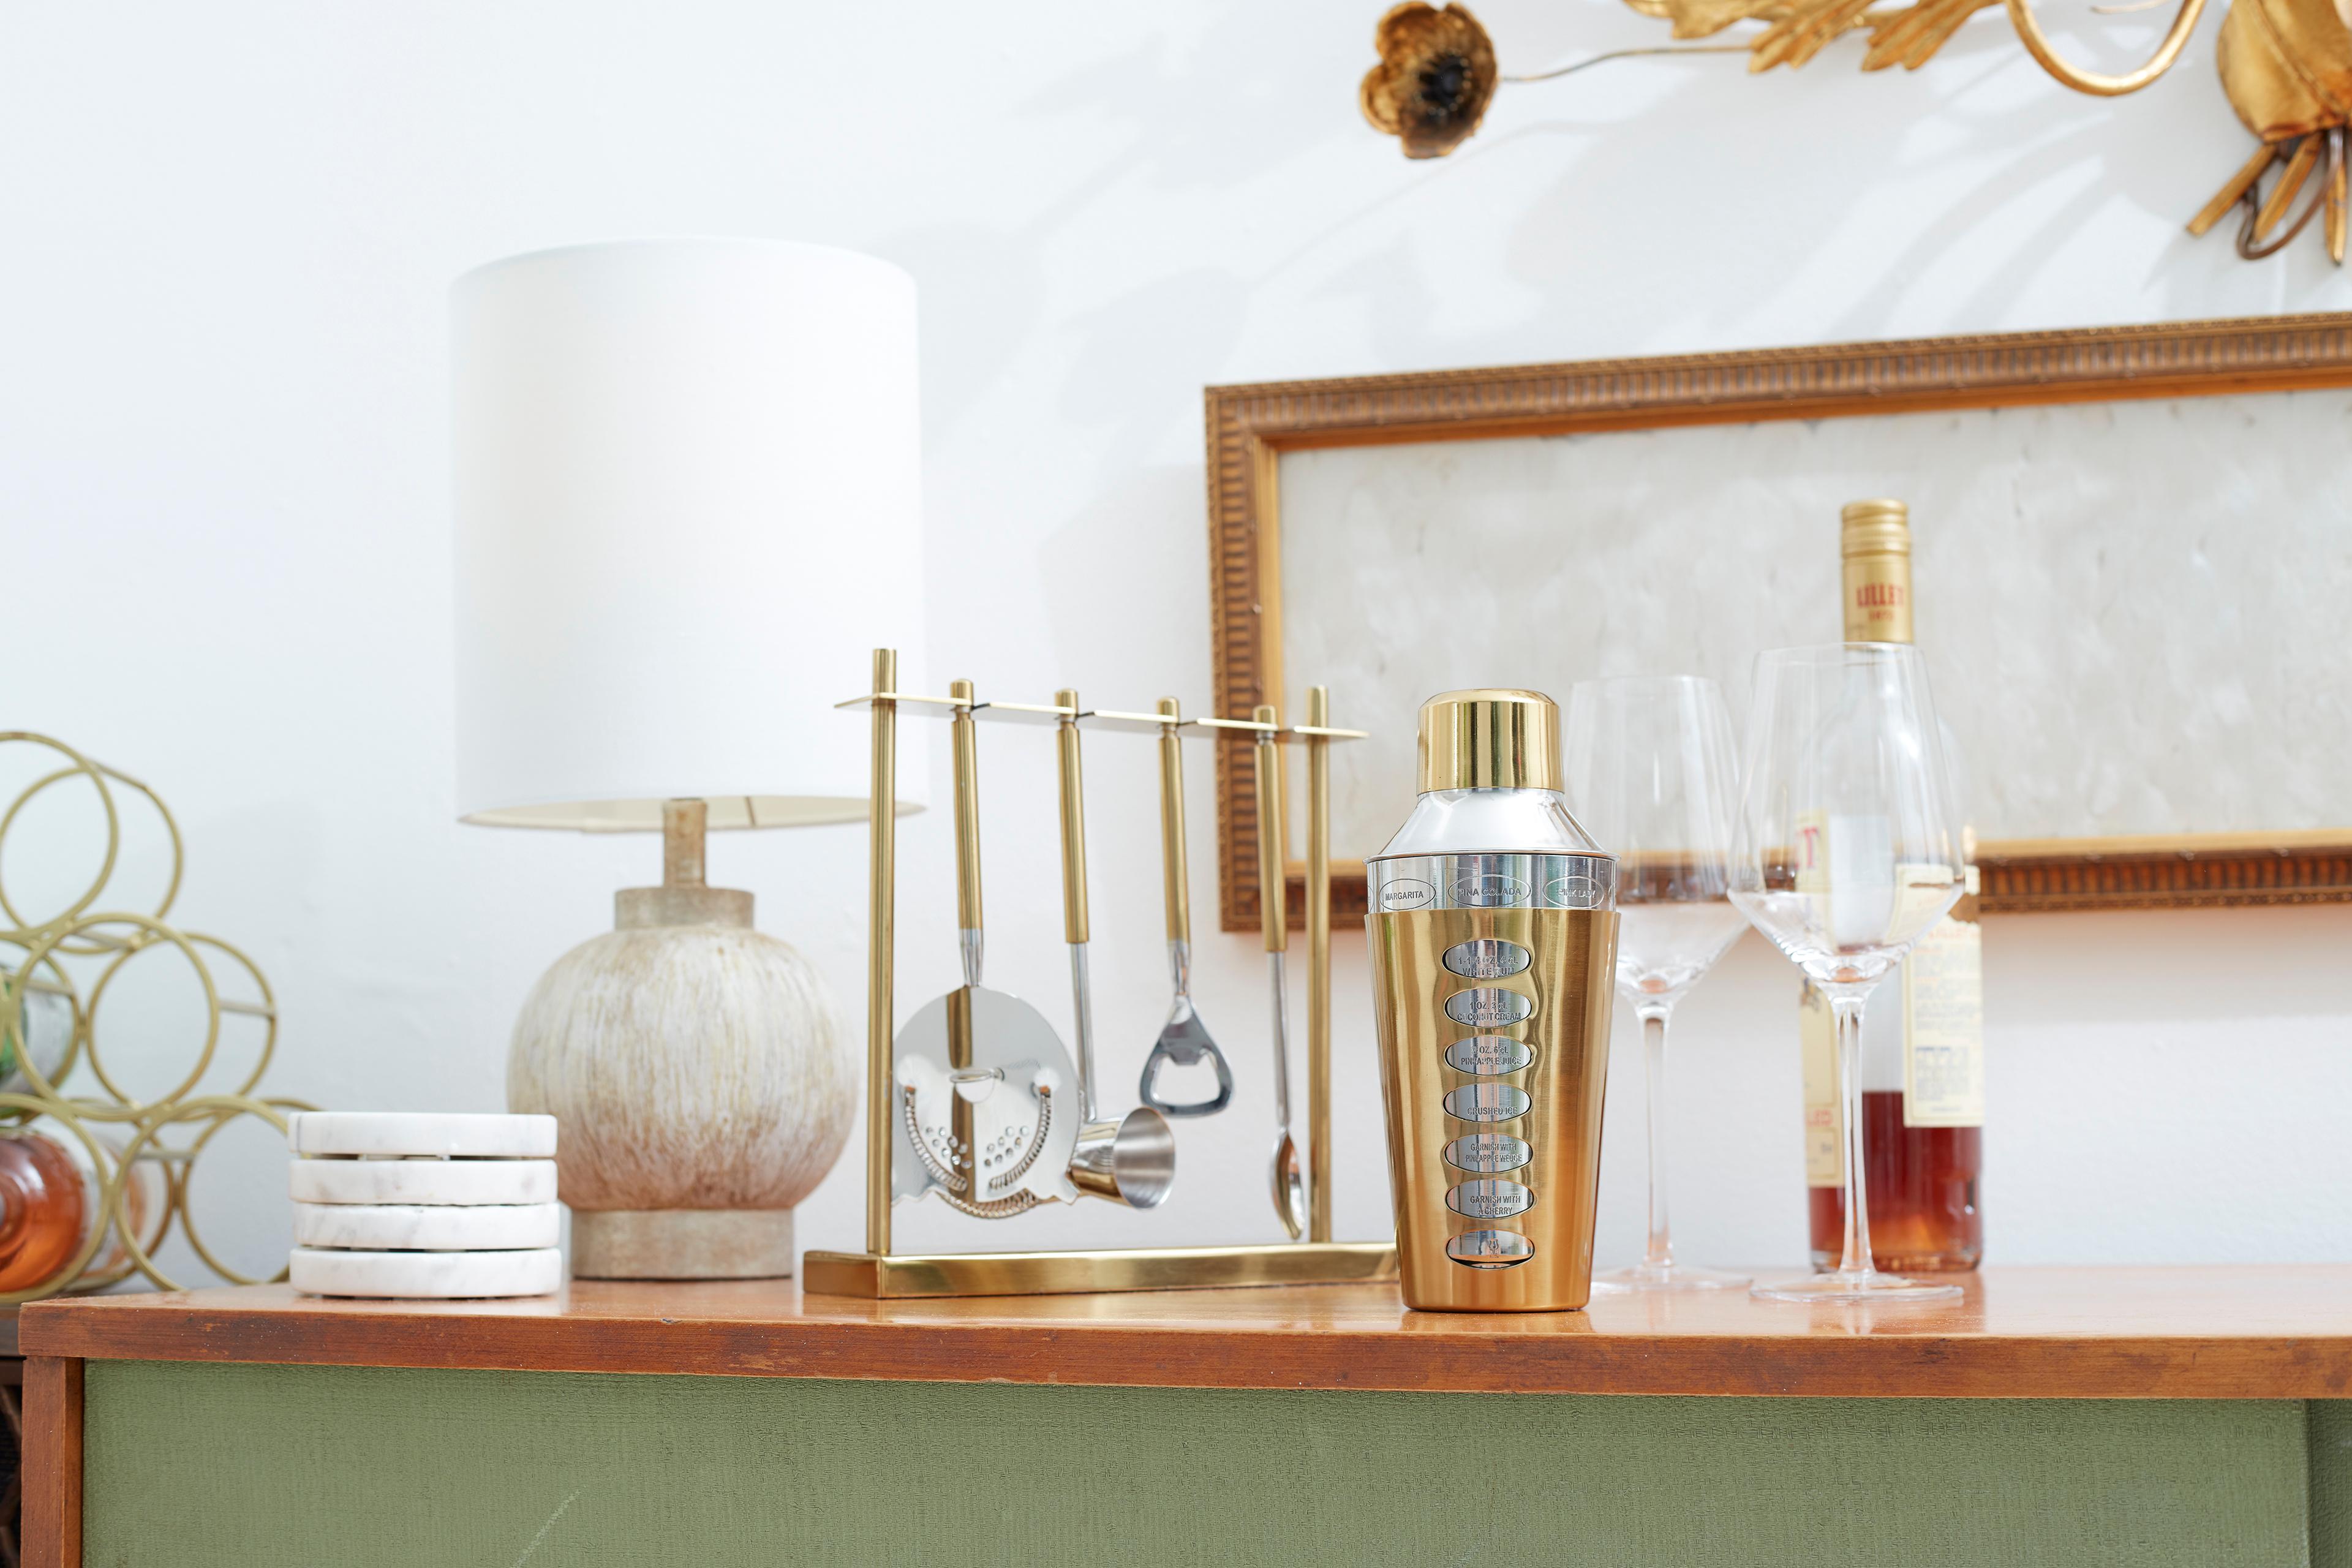 mid-century bar accessories